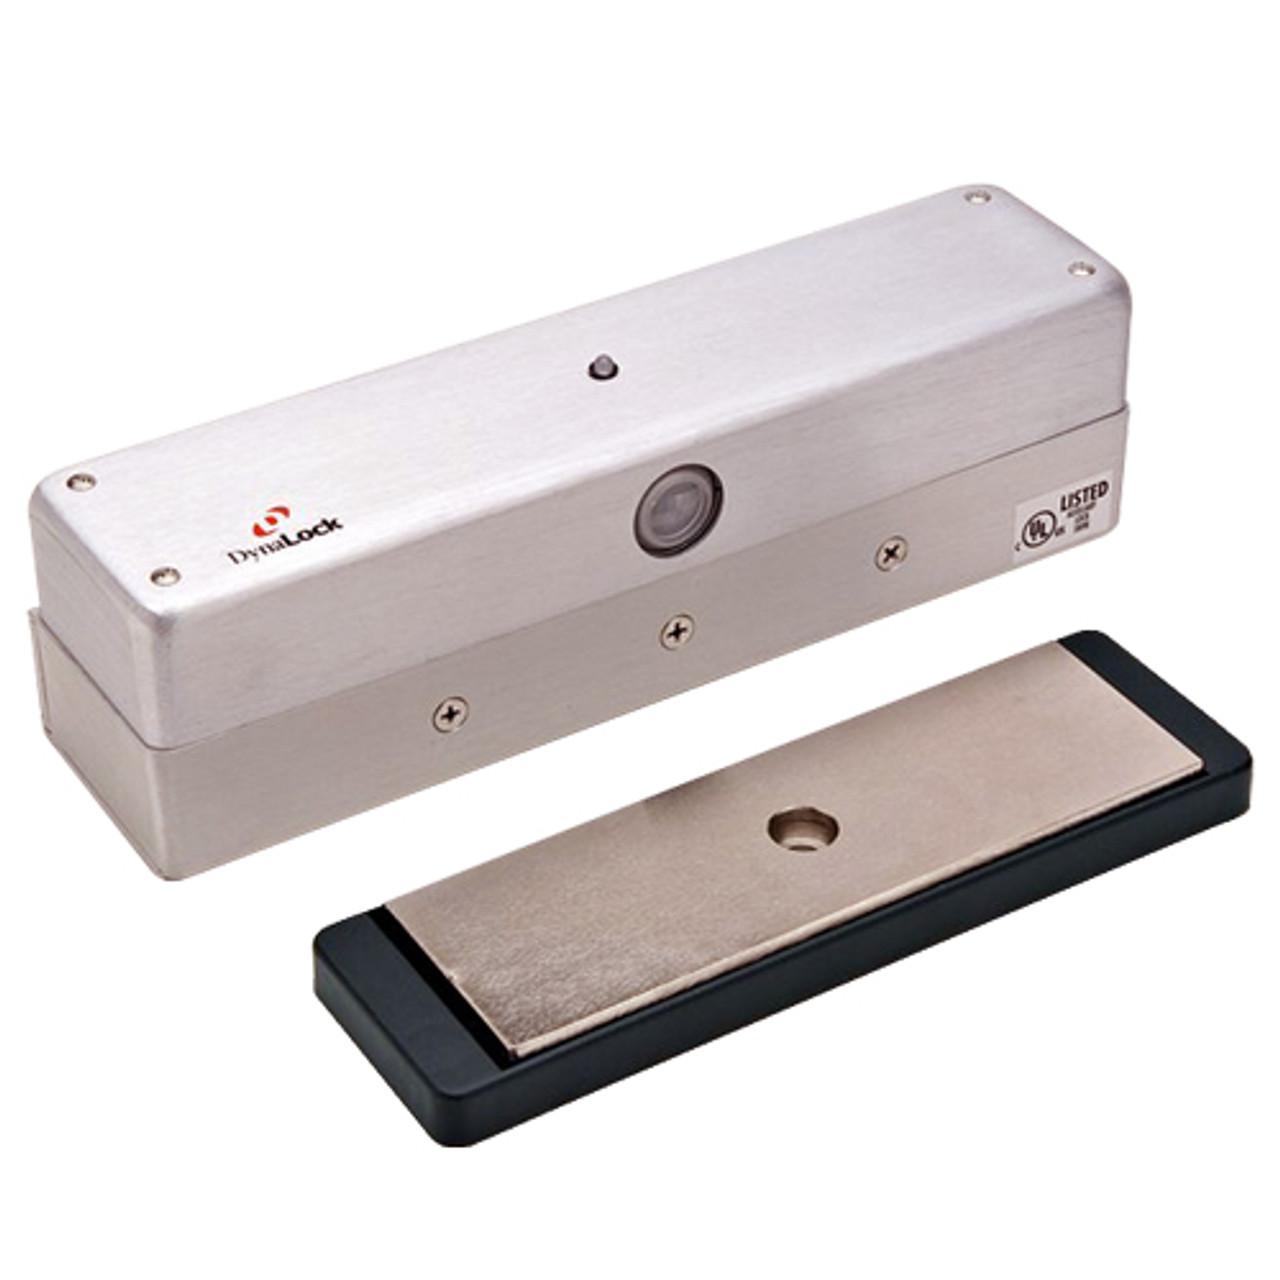 3006-US28 DynaLock 3006 Series 1500 LBs Single Outswing Free Egress Electromagnetic Lock in Satin Aluminum